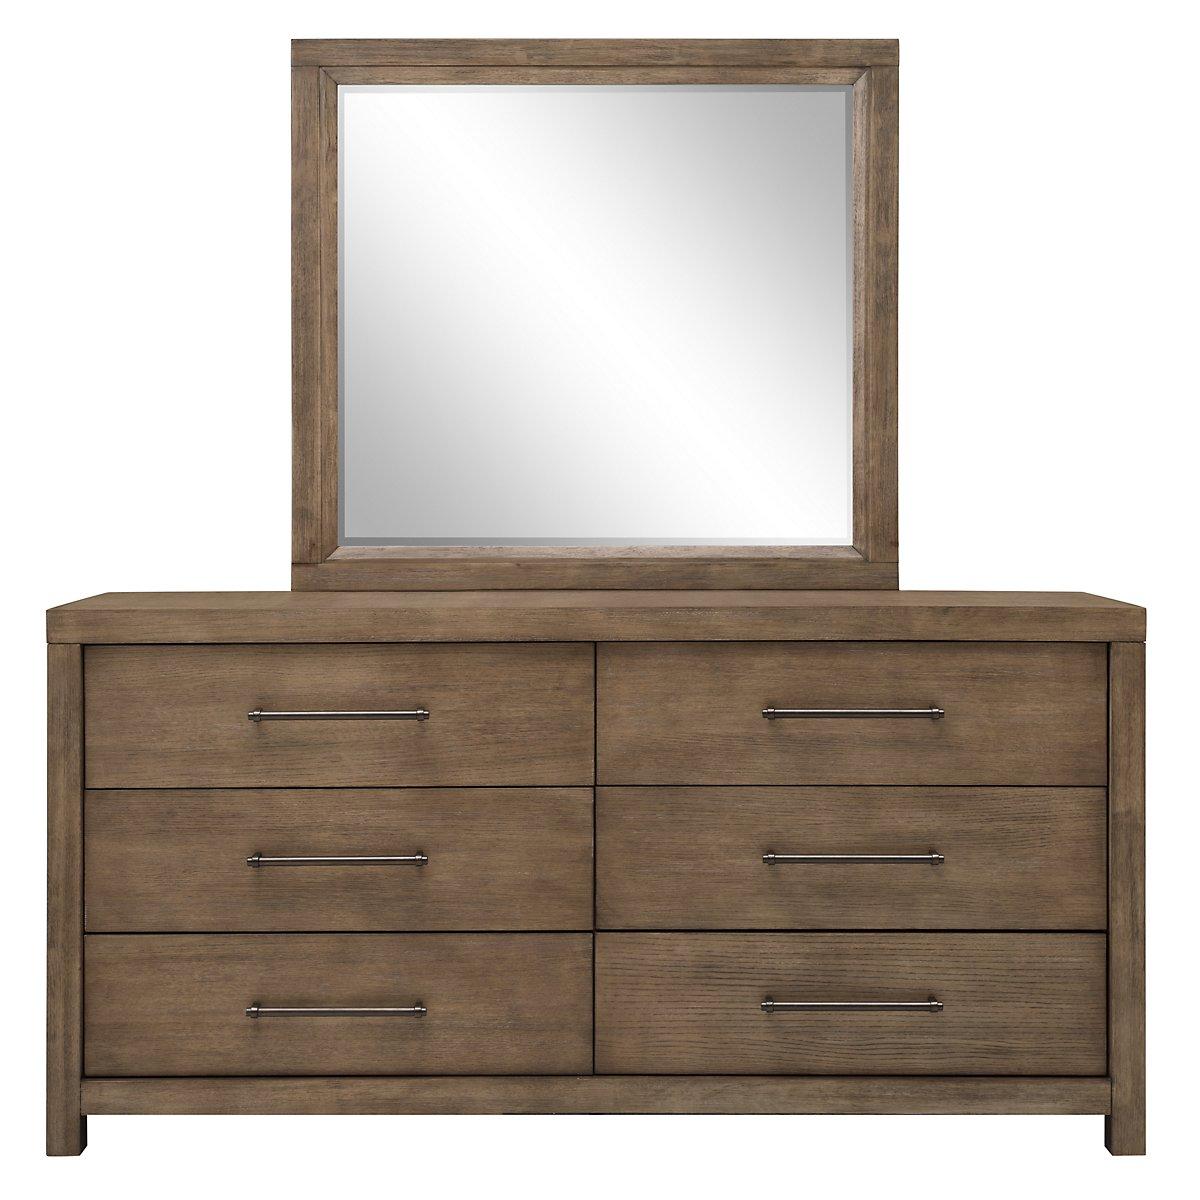 Mirabelle Light Tone Dresser & Mirror